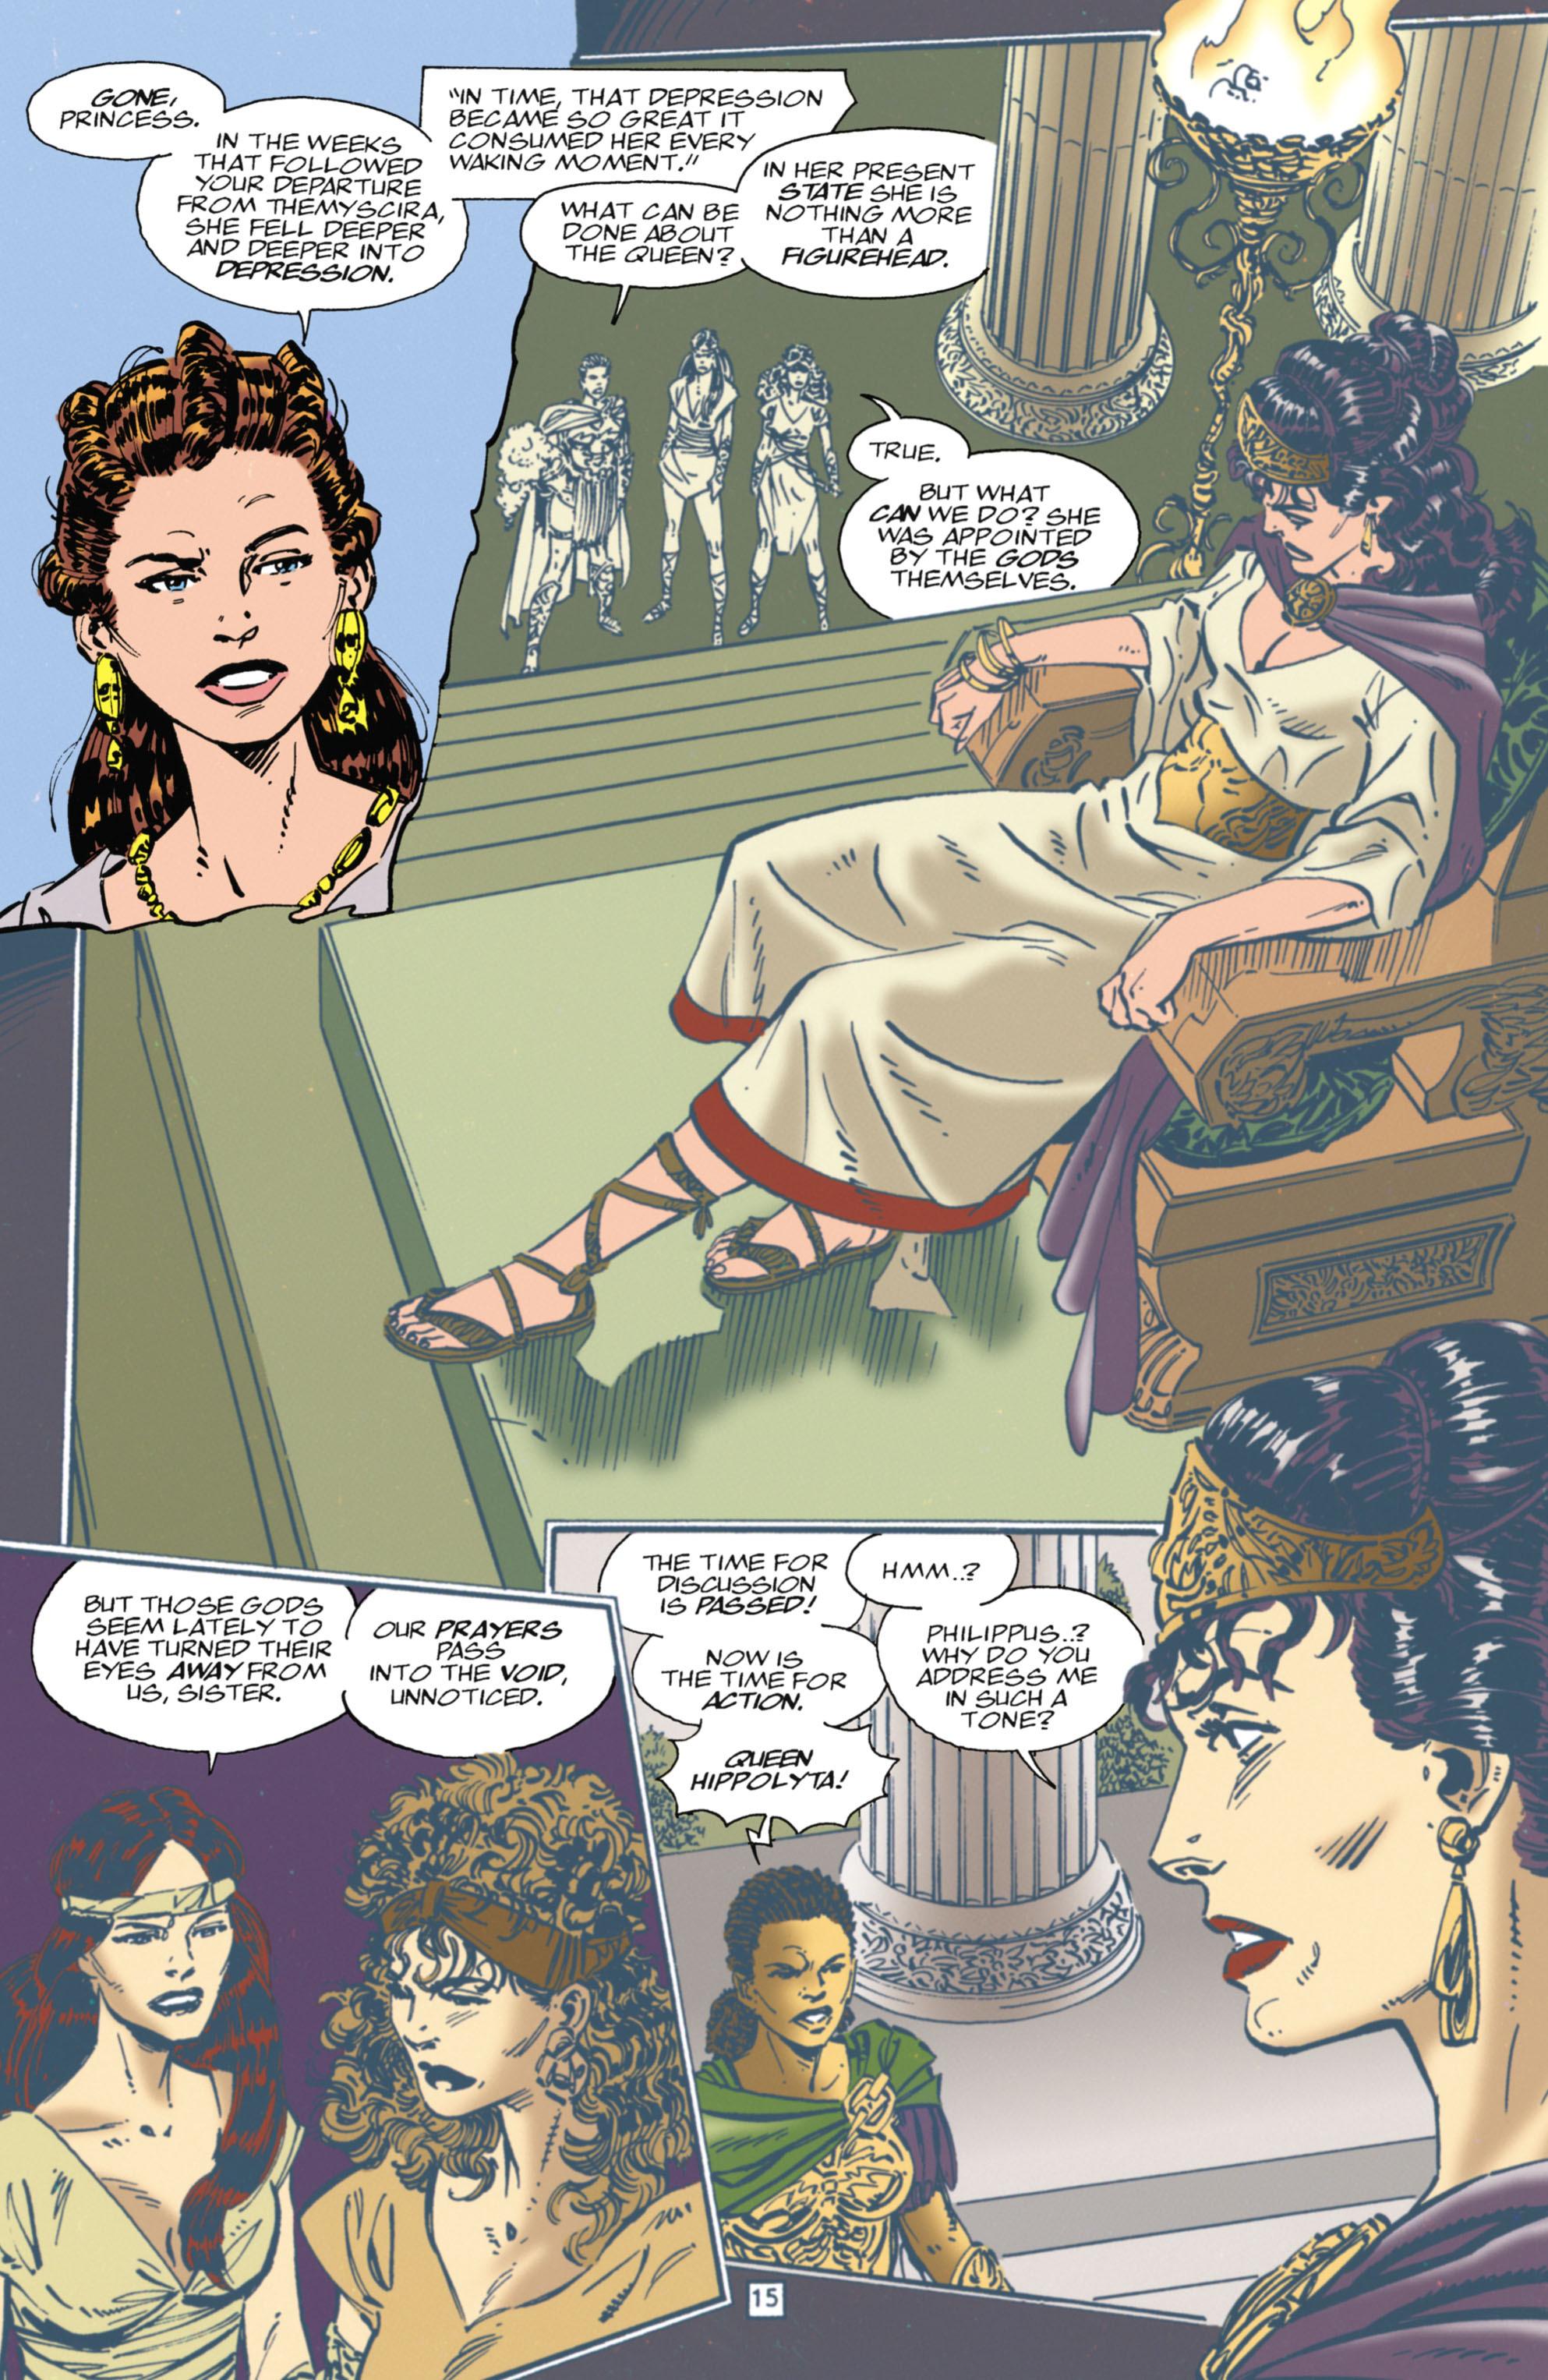 Read online Wonder Woman (1987) comic -  Issue #104 - 15